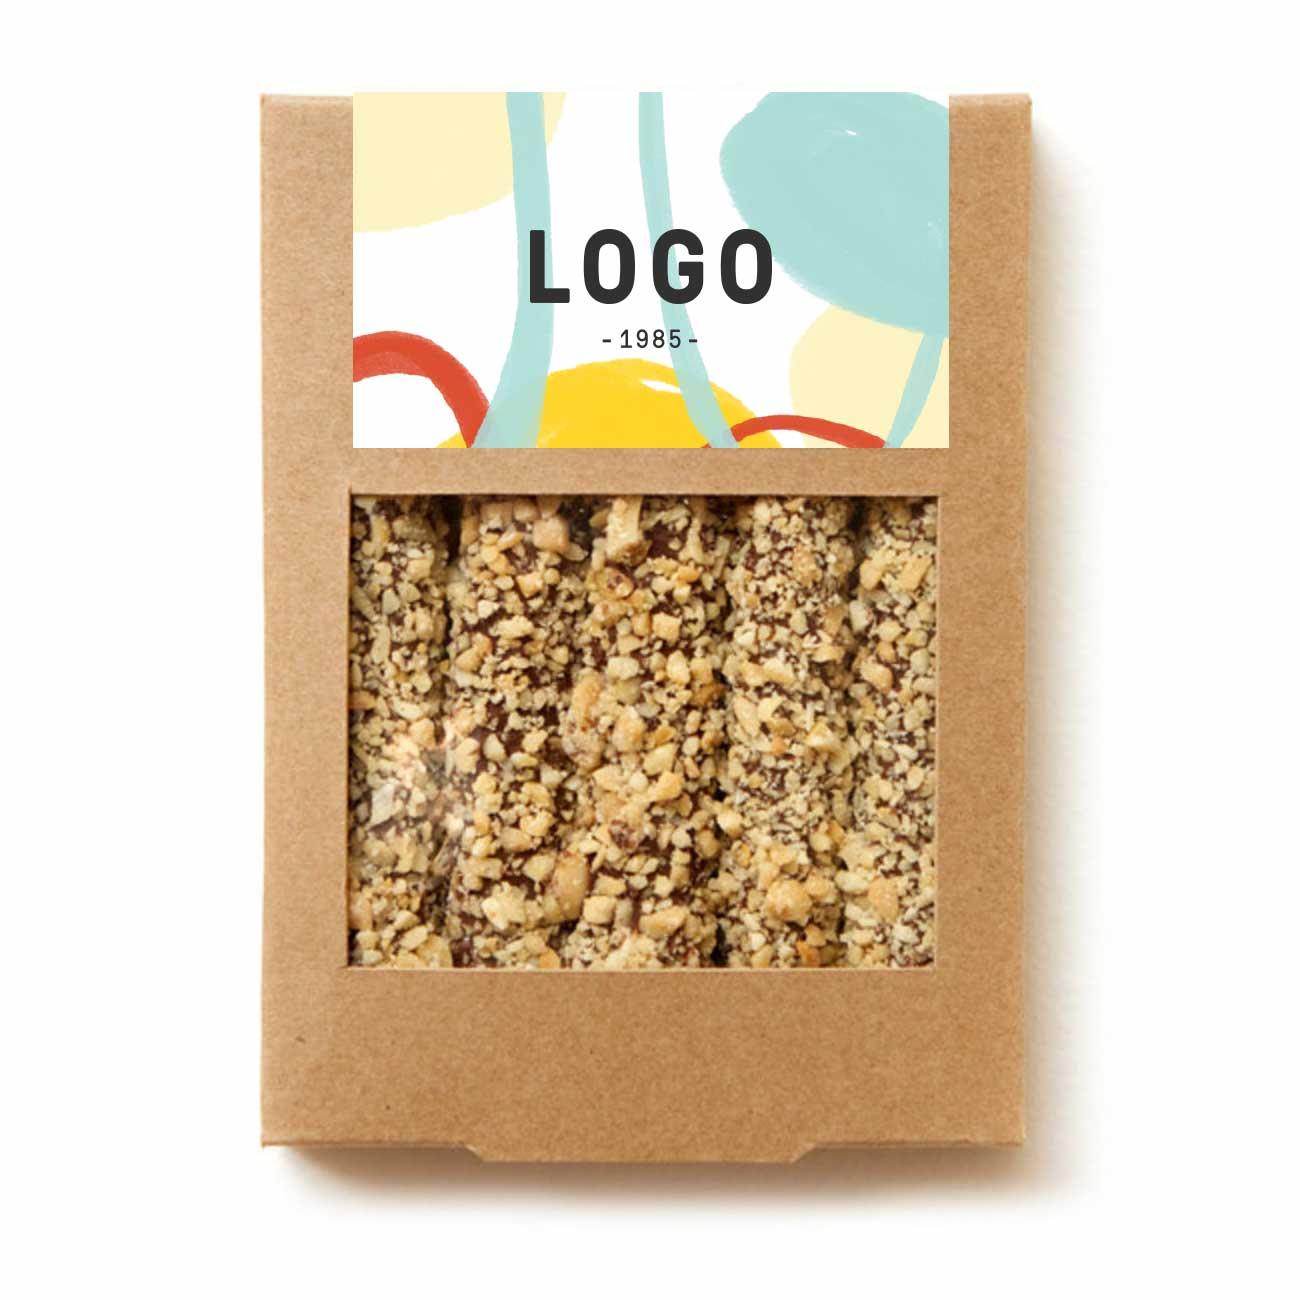 130261 pretzel gift box full color label